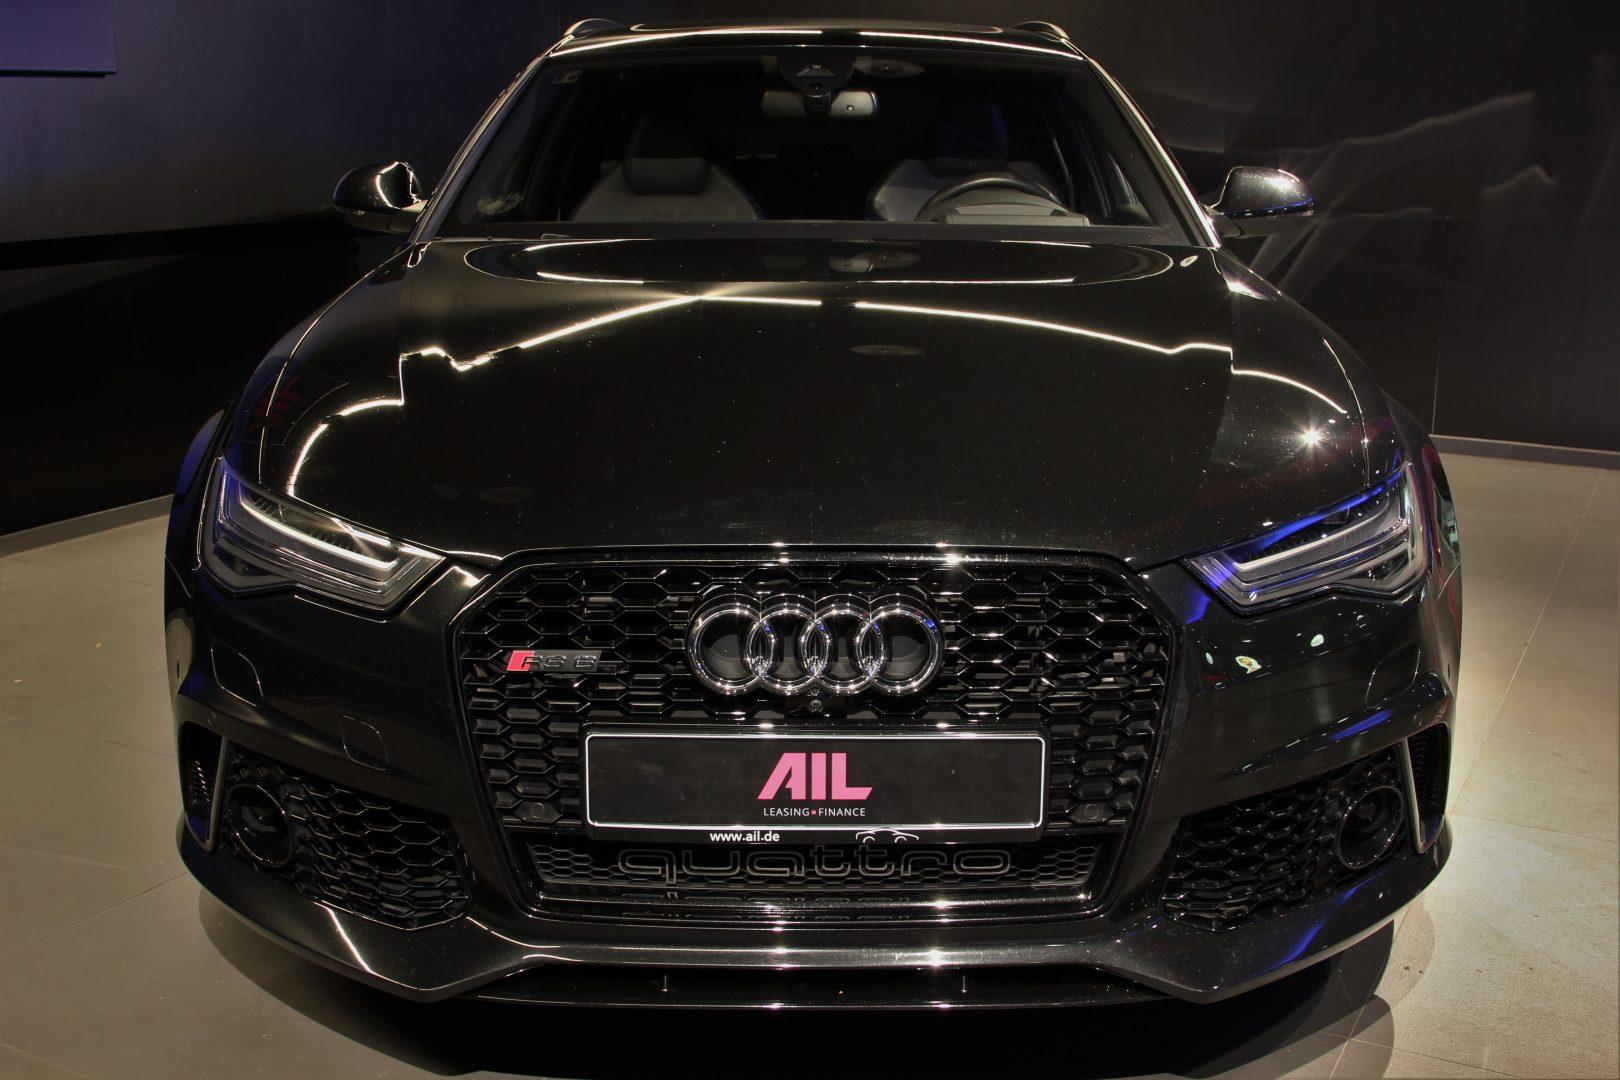 AIL Audi RS6 Avant Performance 4.0 TFSI Carbon Paket  12